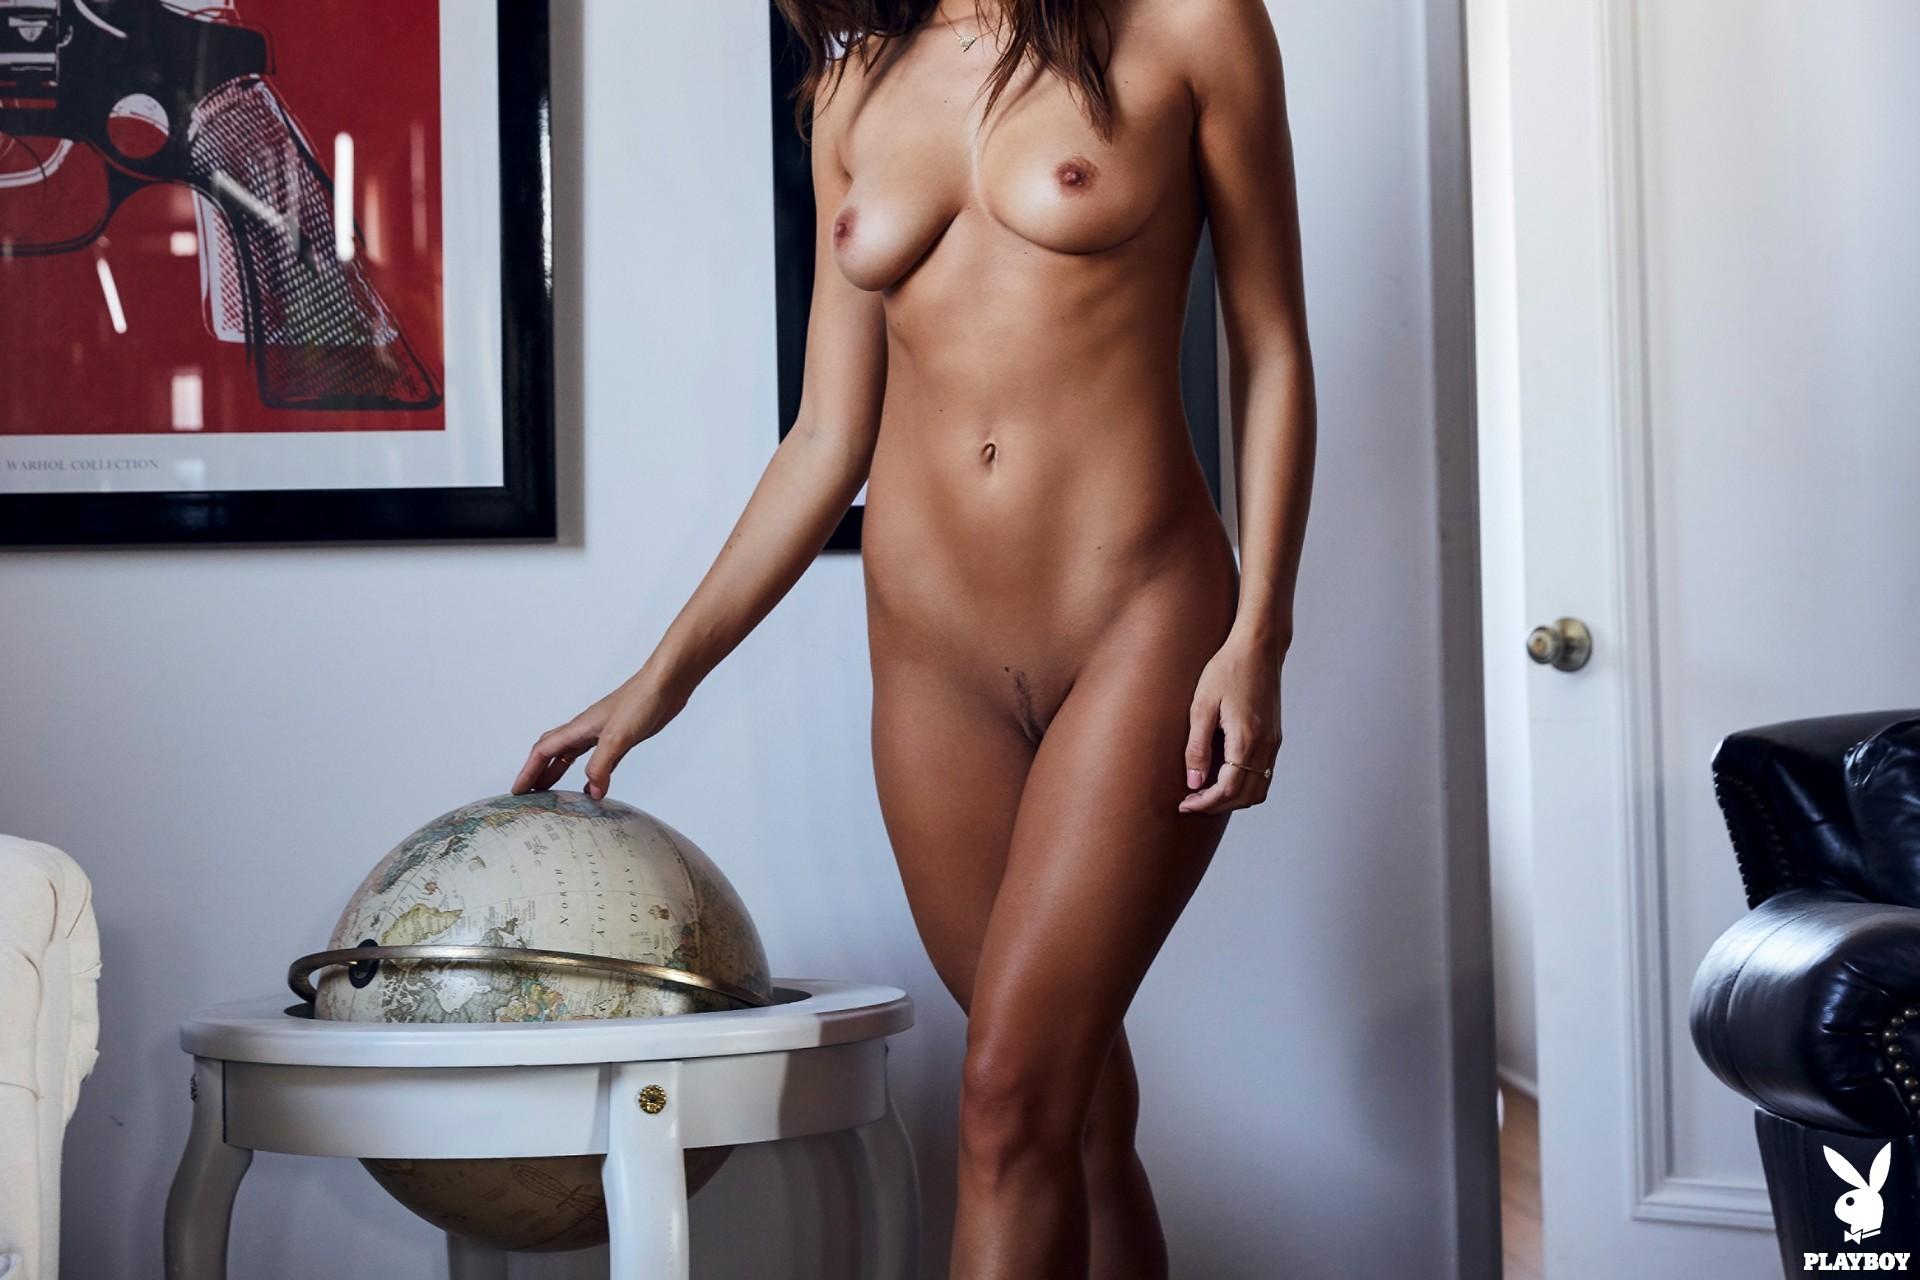 Naked ambition by ashley ladd